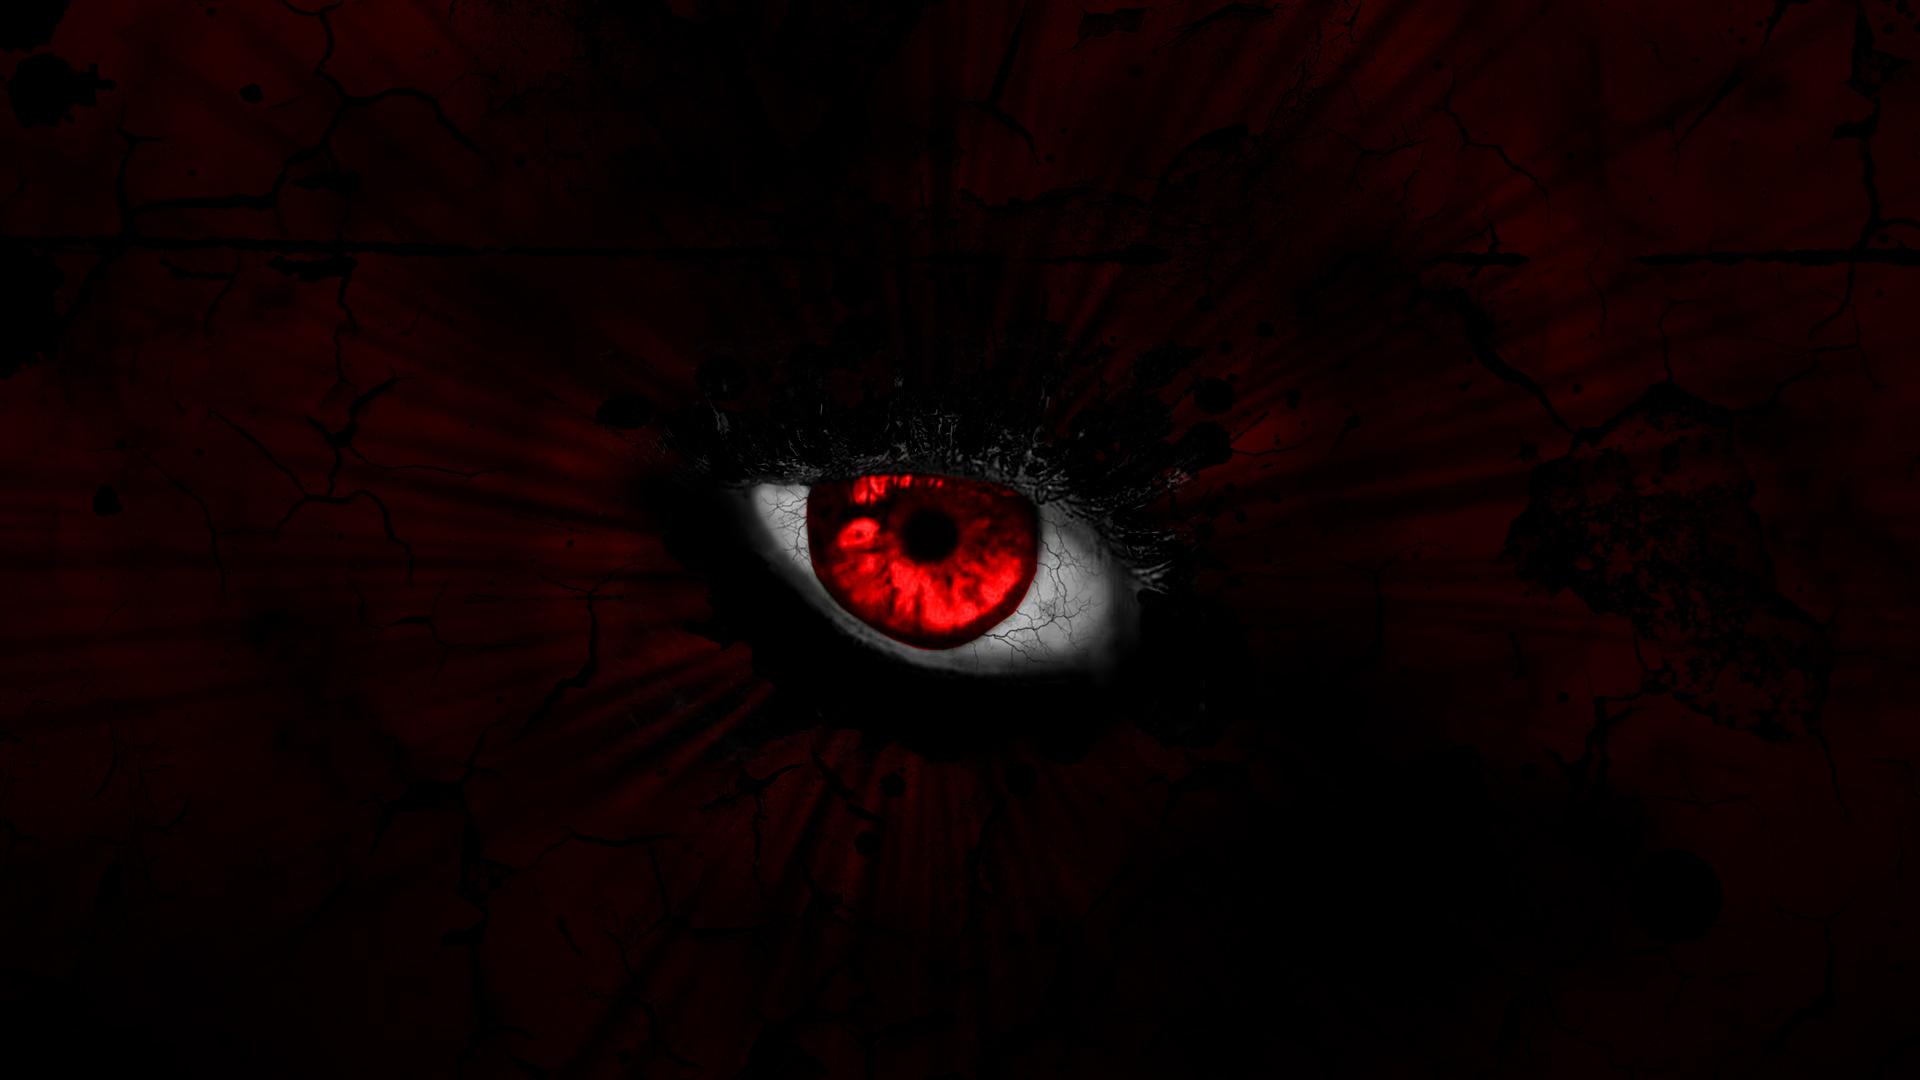 1920x1080px Red Eye Wallpaper Wallpapersafari